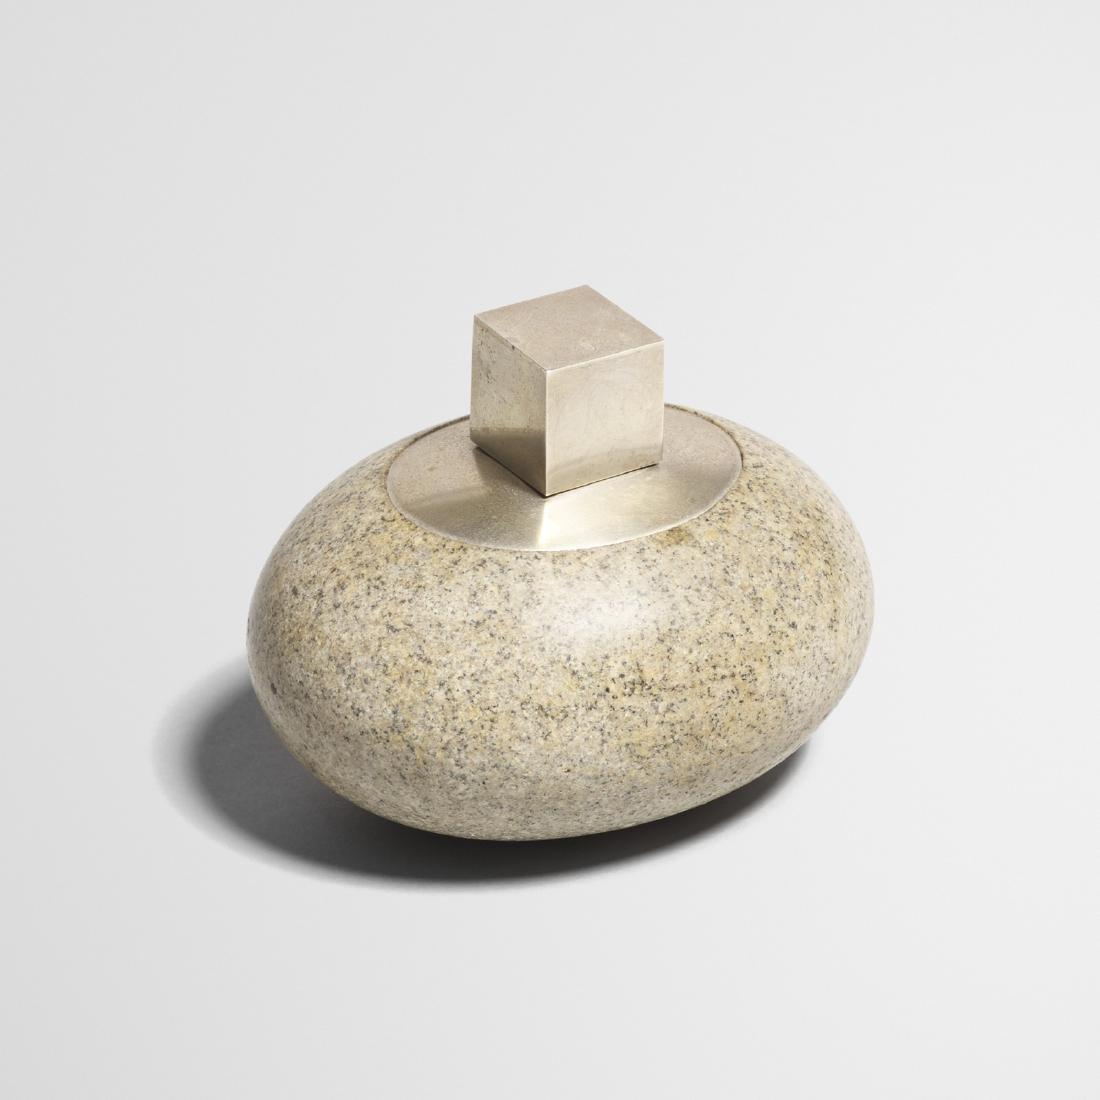 John Prip, River Stone lidded box